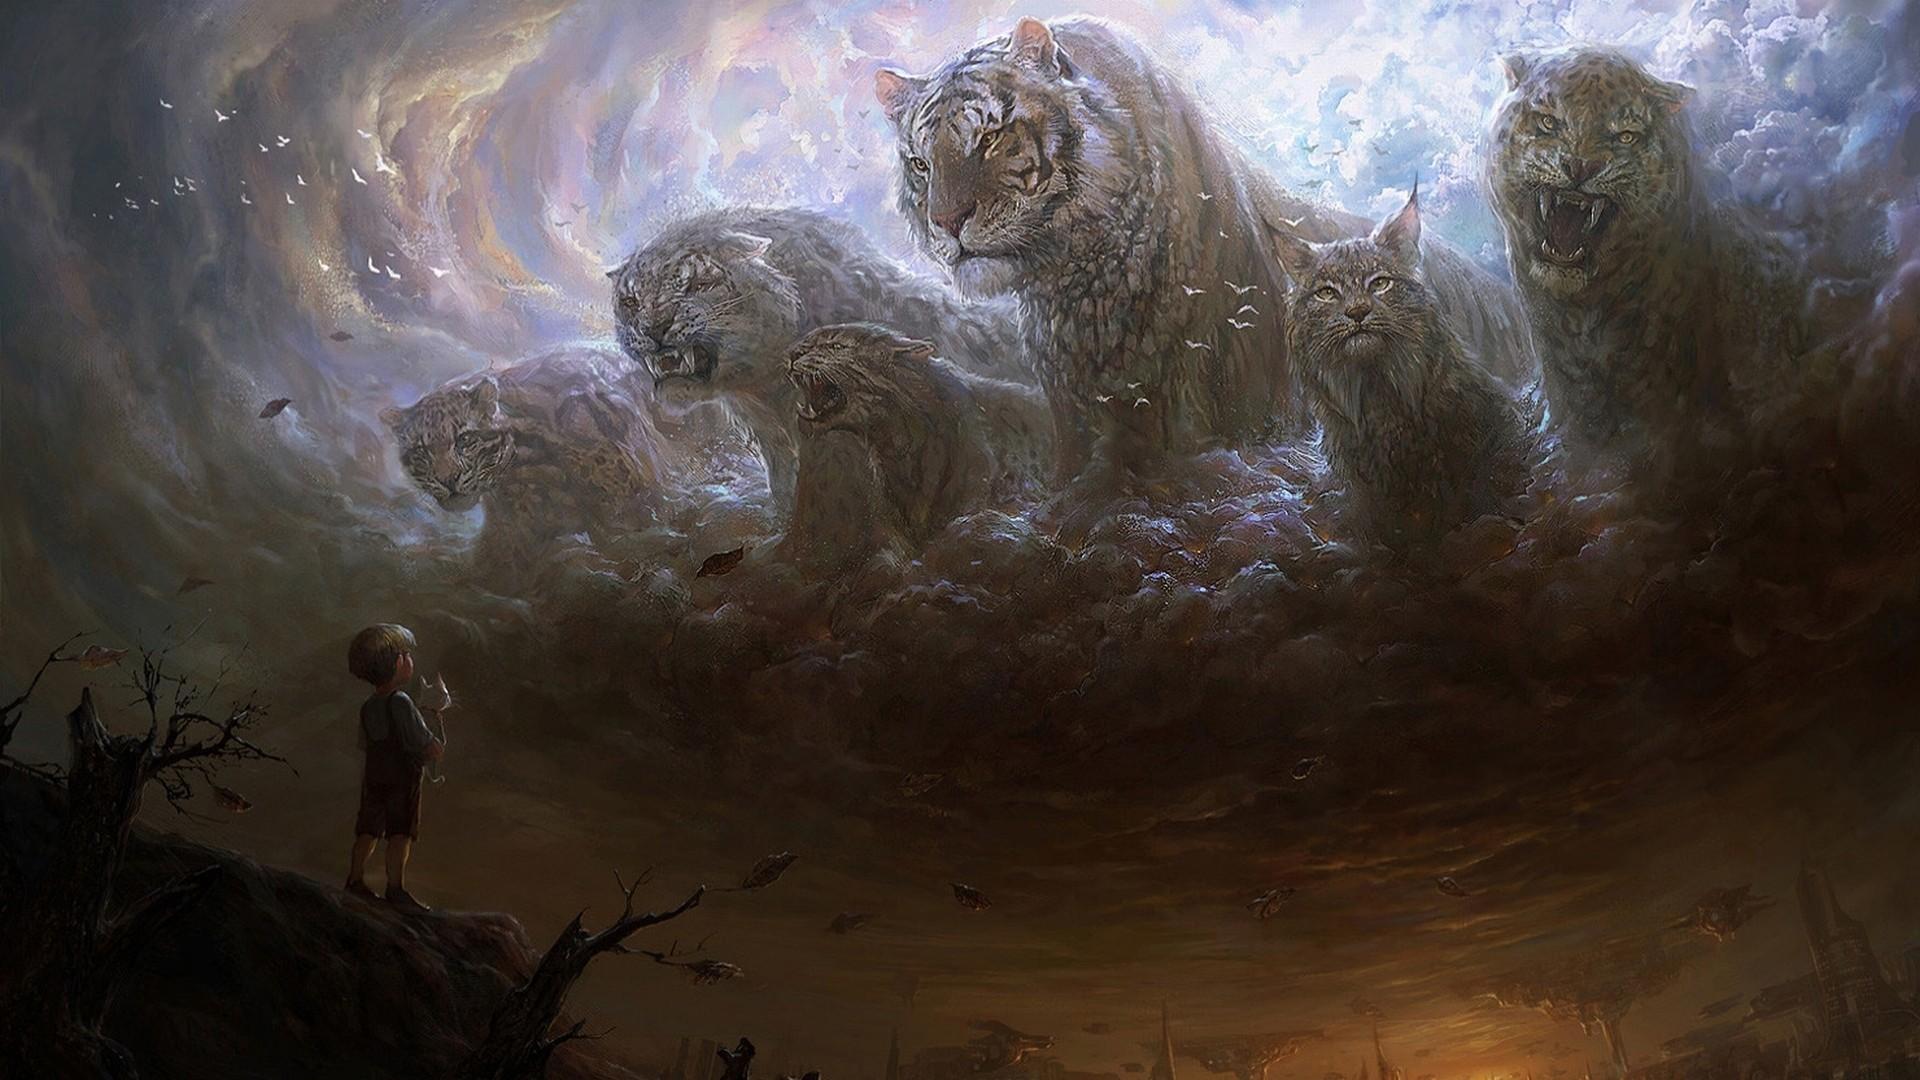 Lion Animal Wallpaper 3d Children Artwork Fantasy Art Digital Art Tiger Clouds